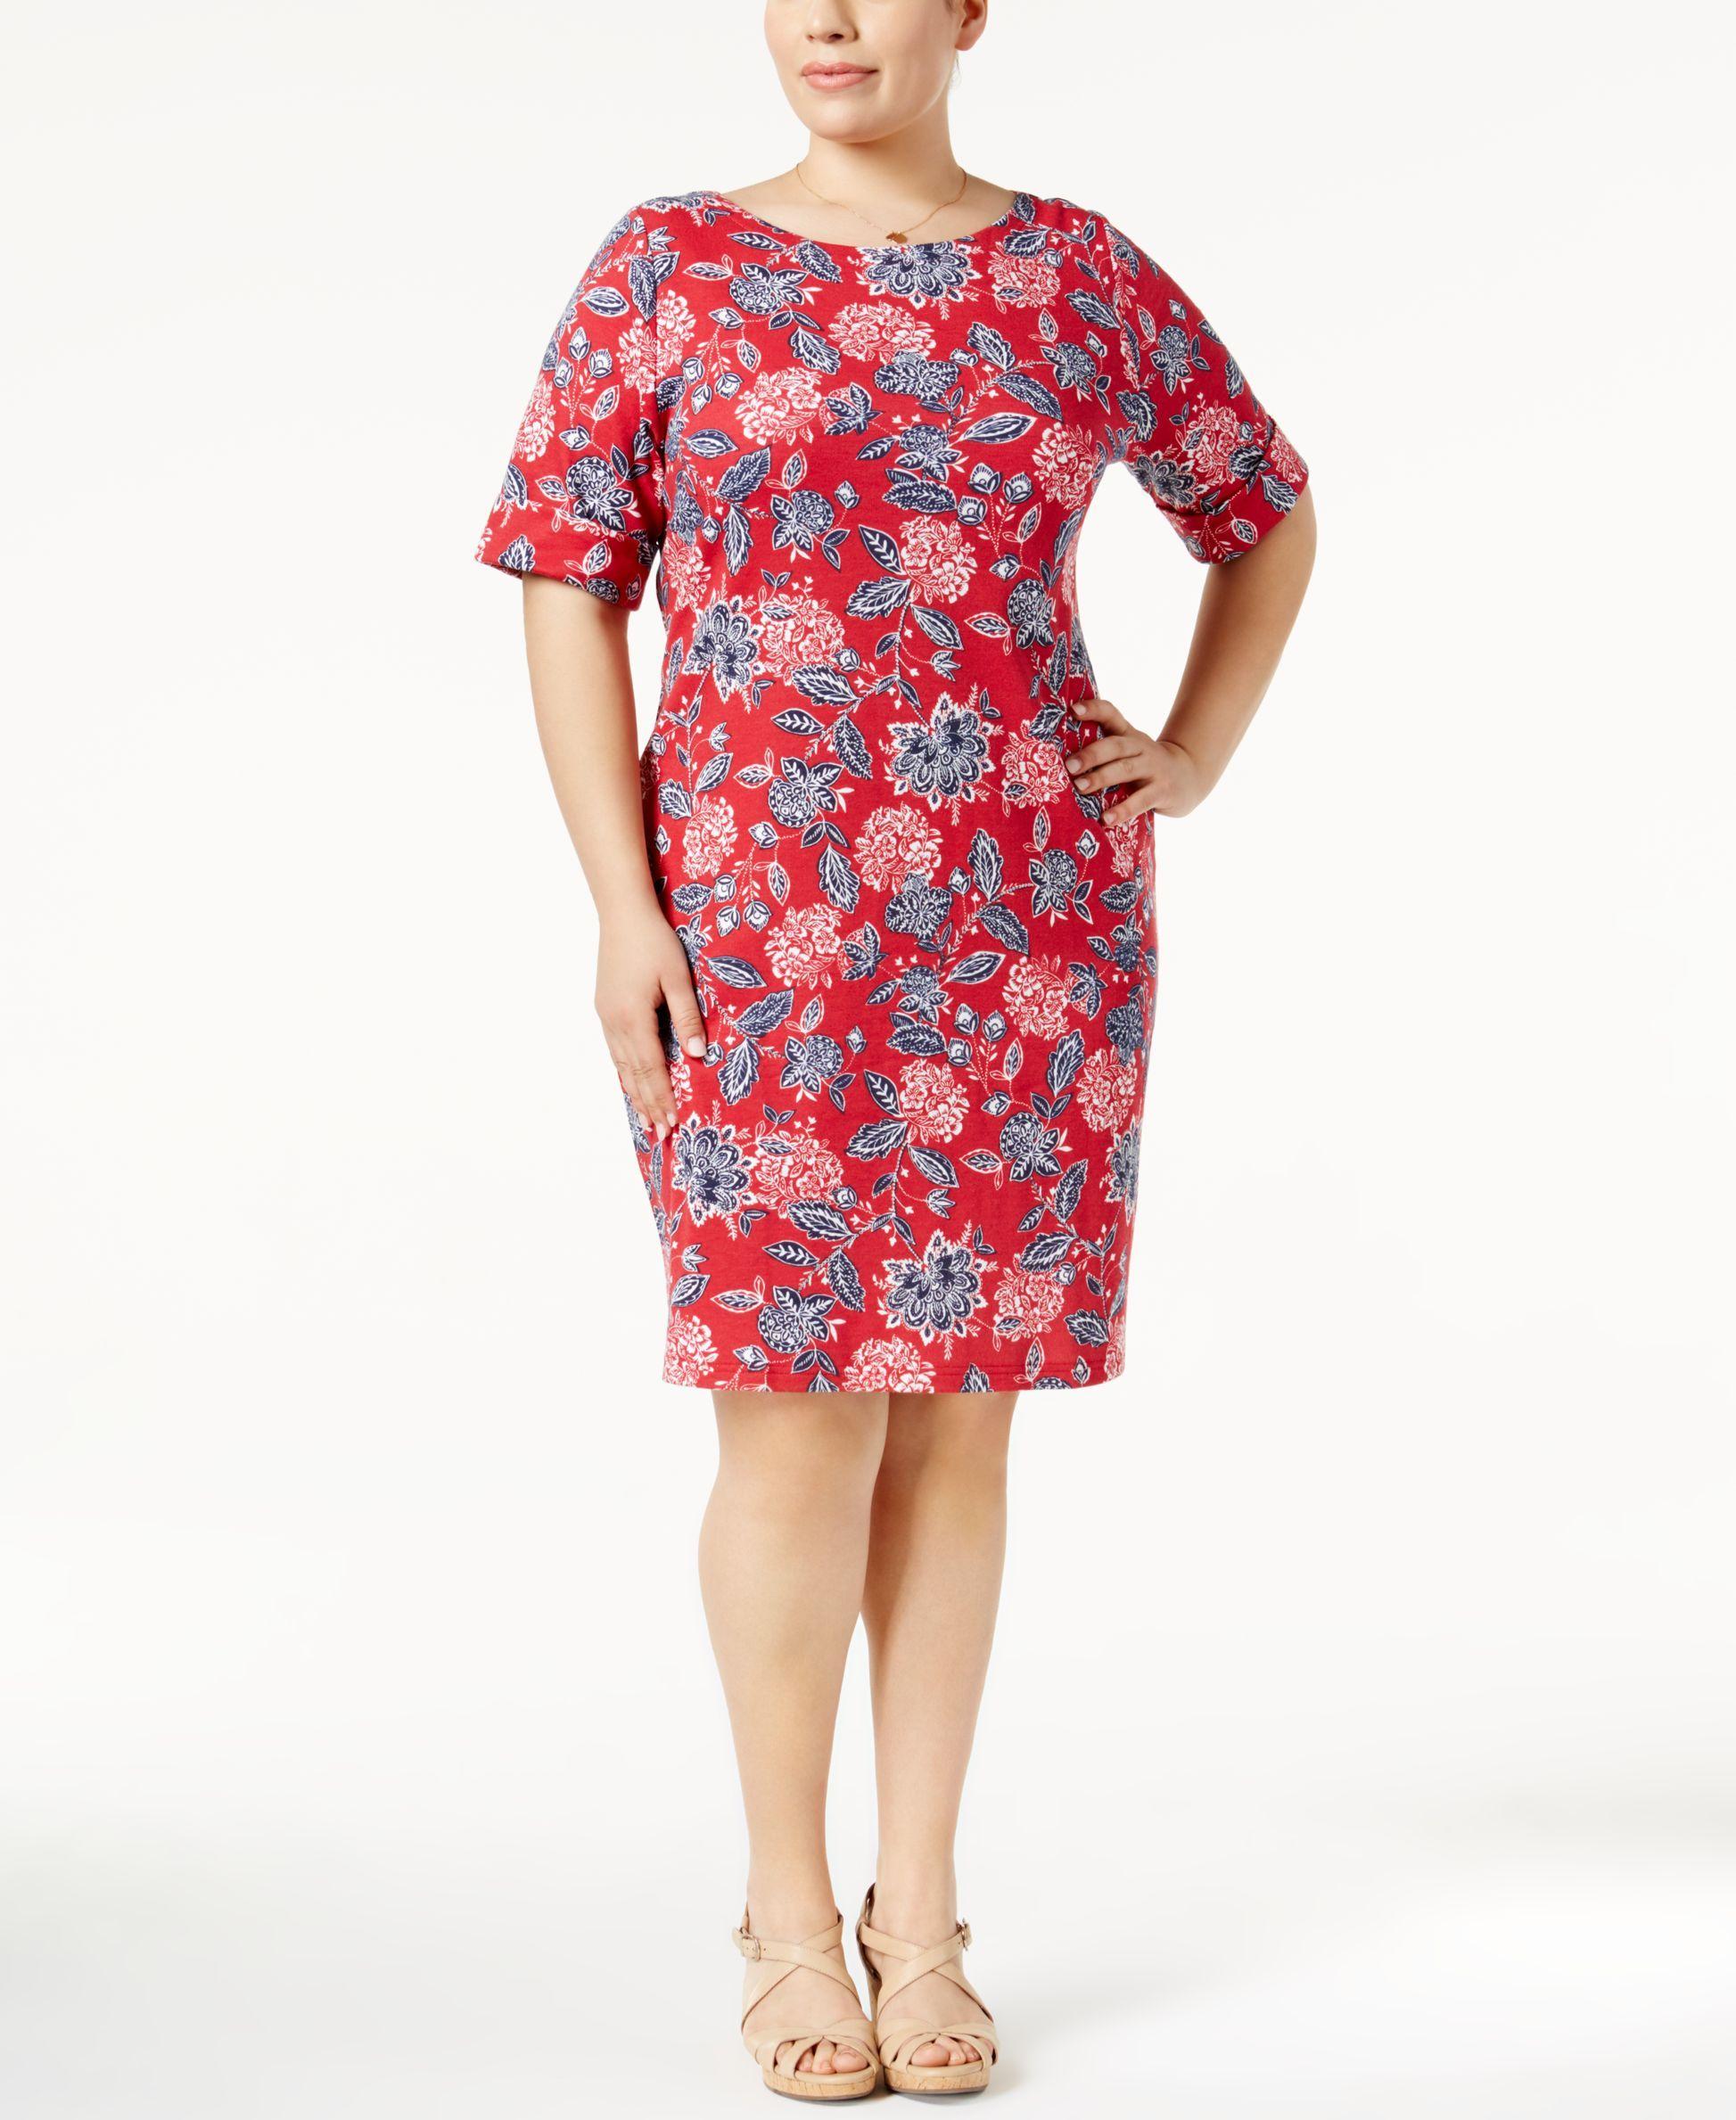 7055970464a5 Karen Scott Plus Size Bandana-Print Dress, Only at Macy's | Products ...